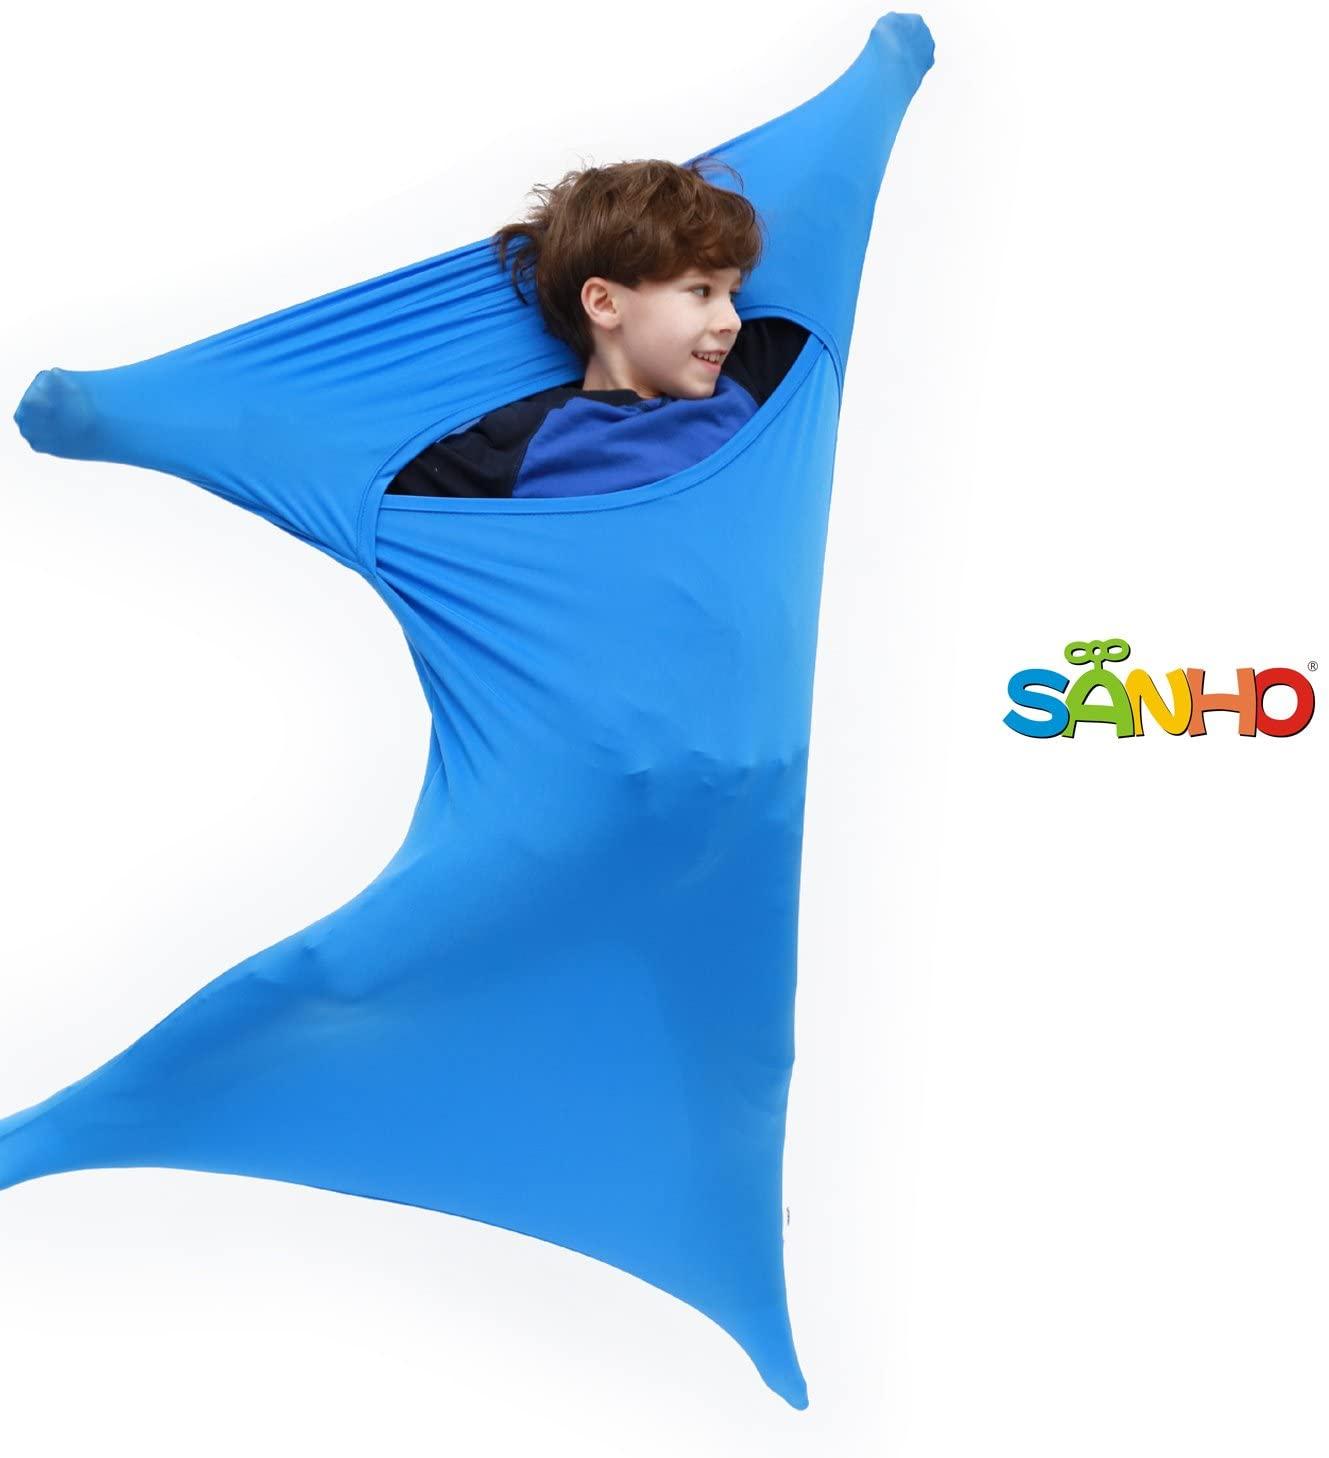 SANHO Premium Sensory Sock Budy Sock, Perfect for Children with Sensory Processing Disorder, Updated Version (Blue, Medium)